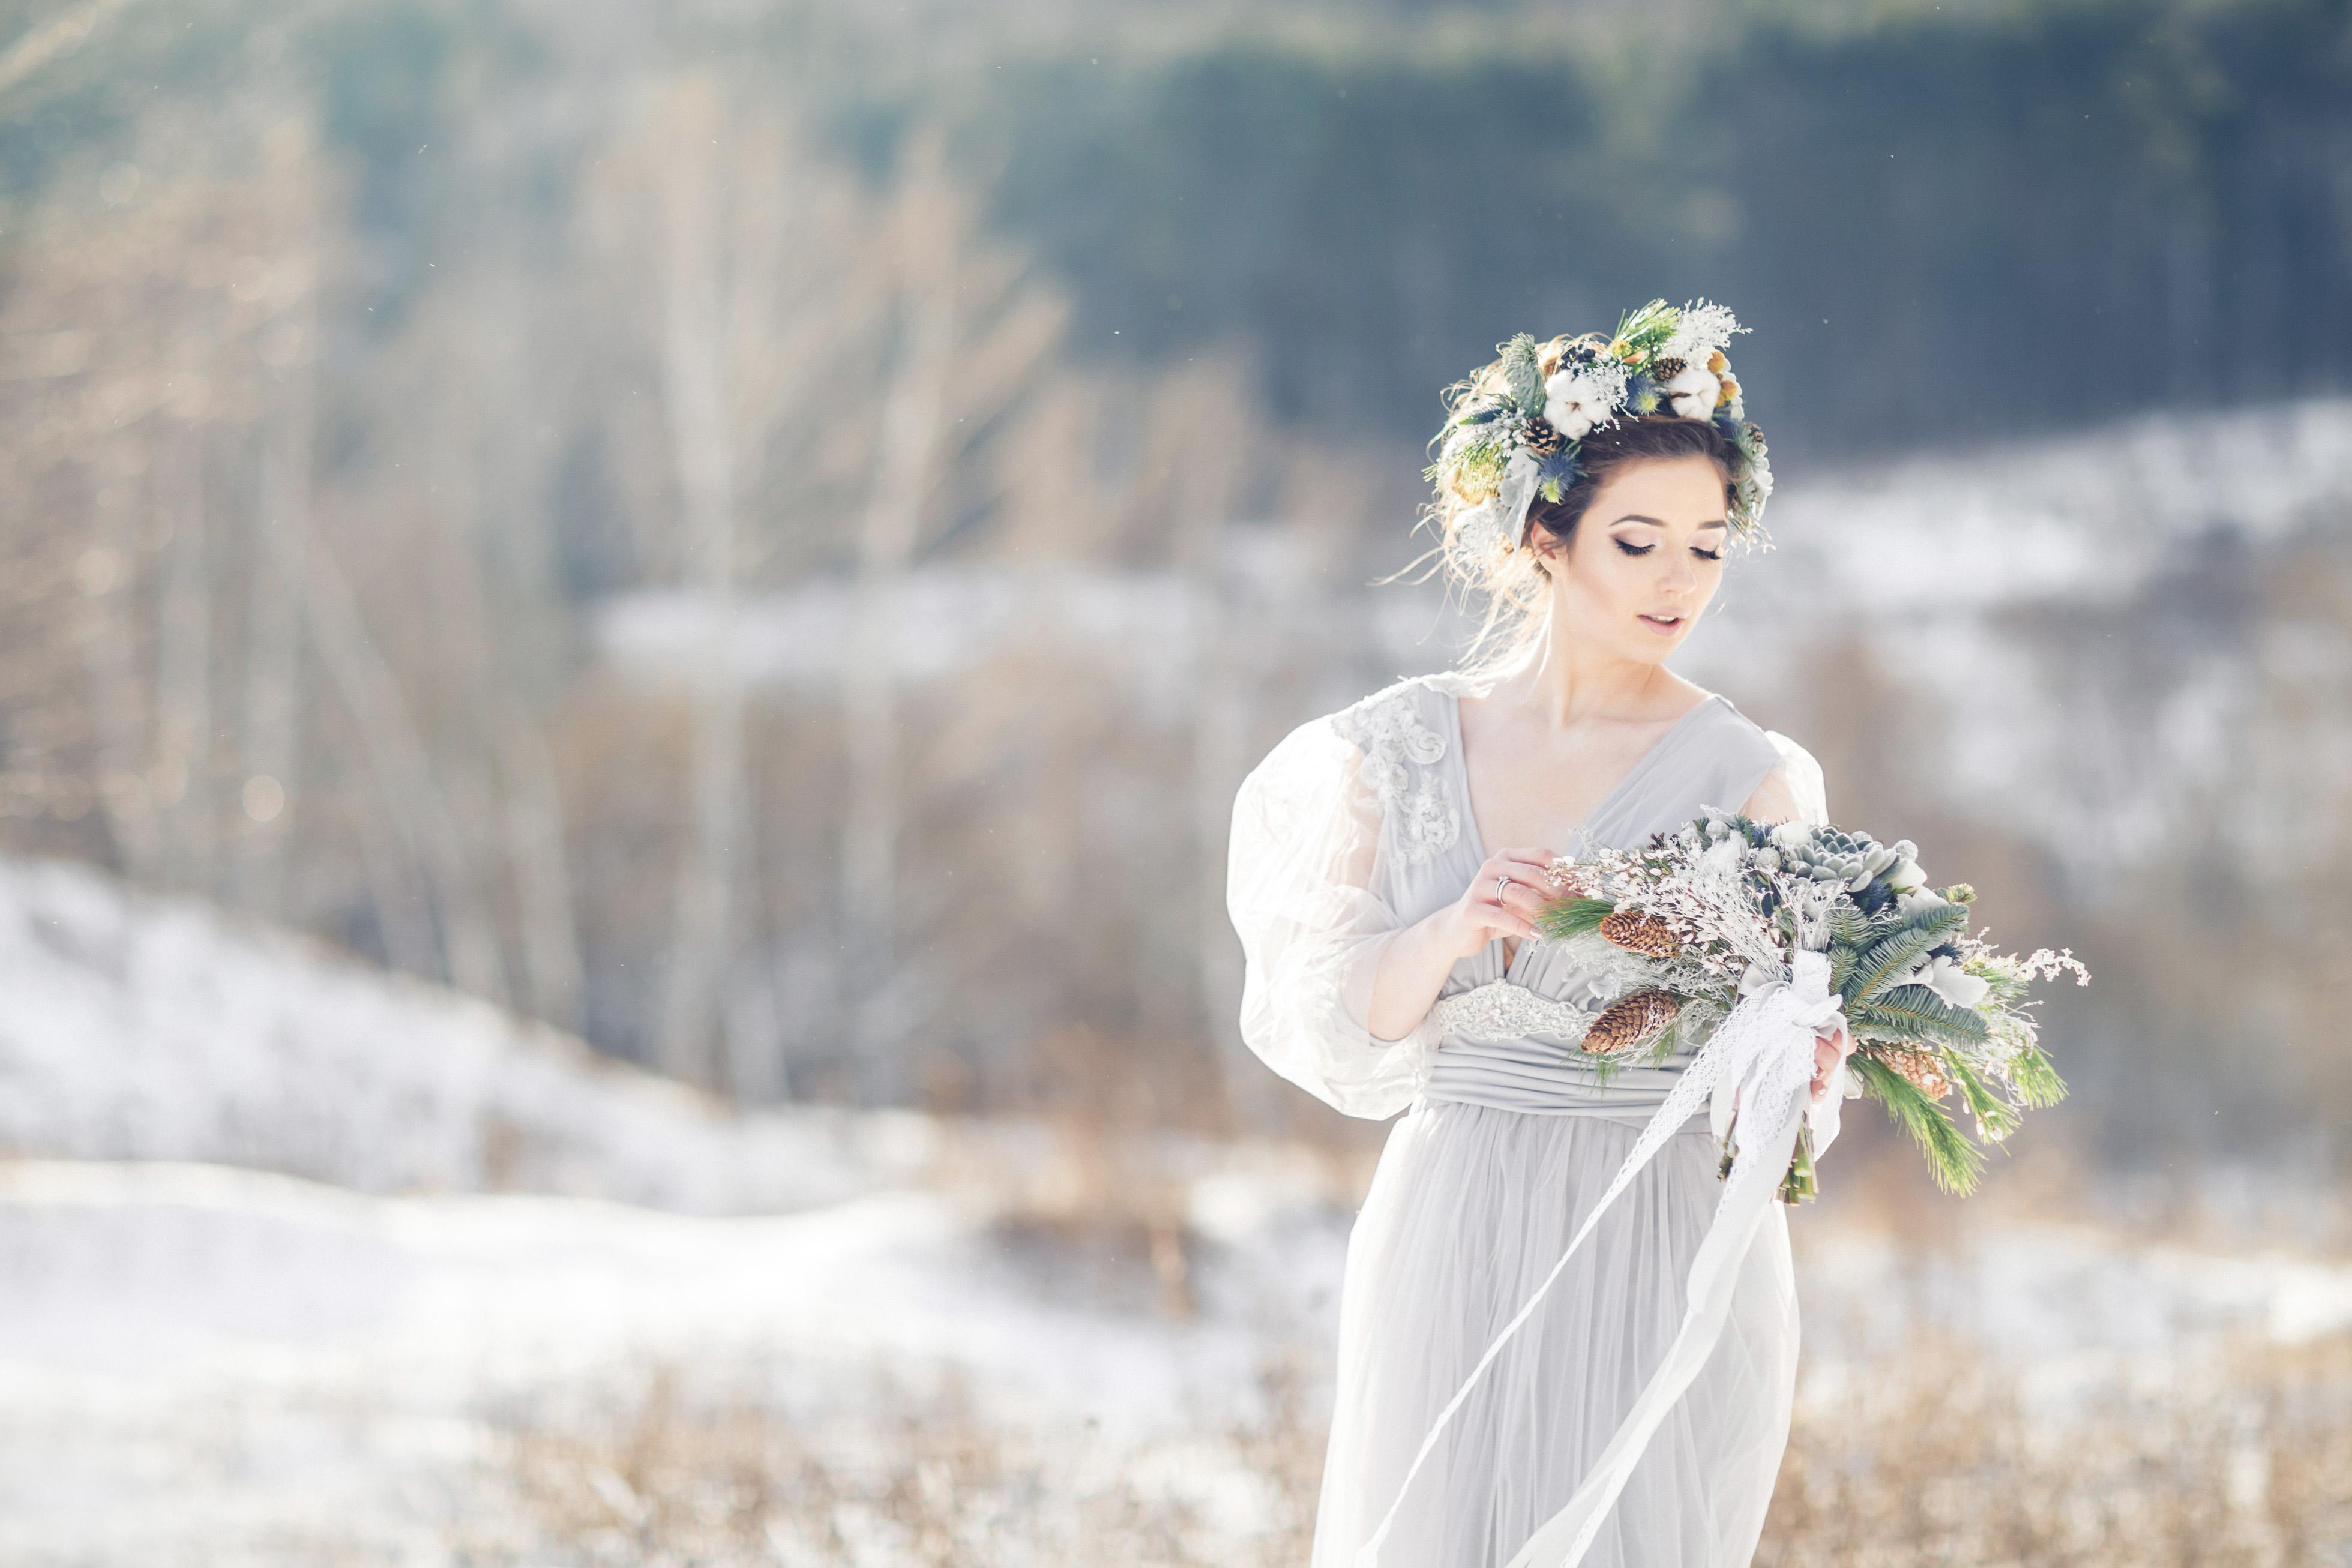 Beautiful bride admiring wedding bouquet. Winter wedding. Winter